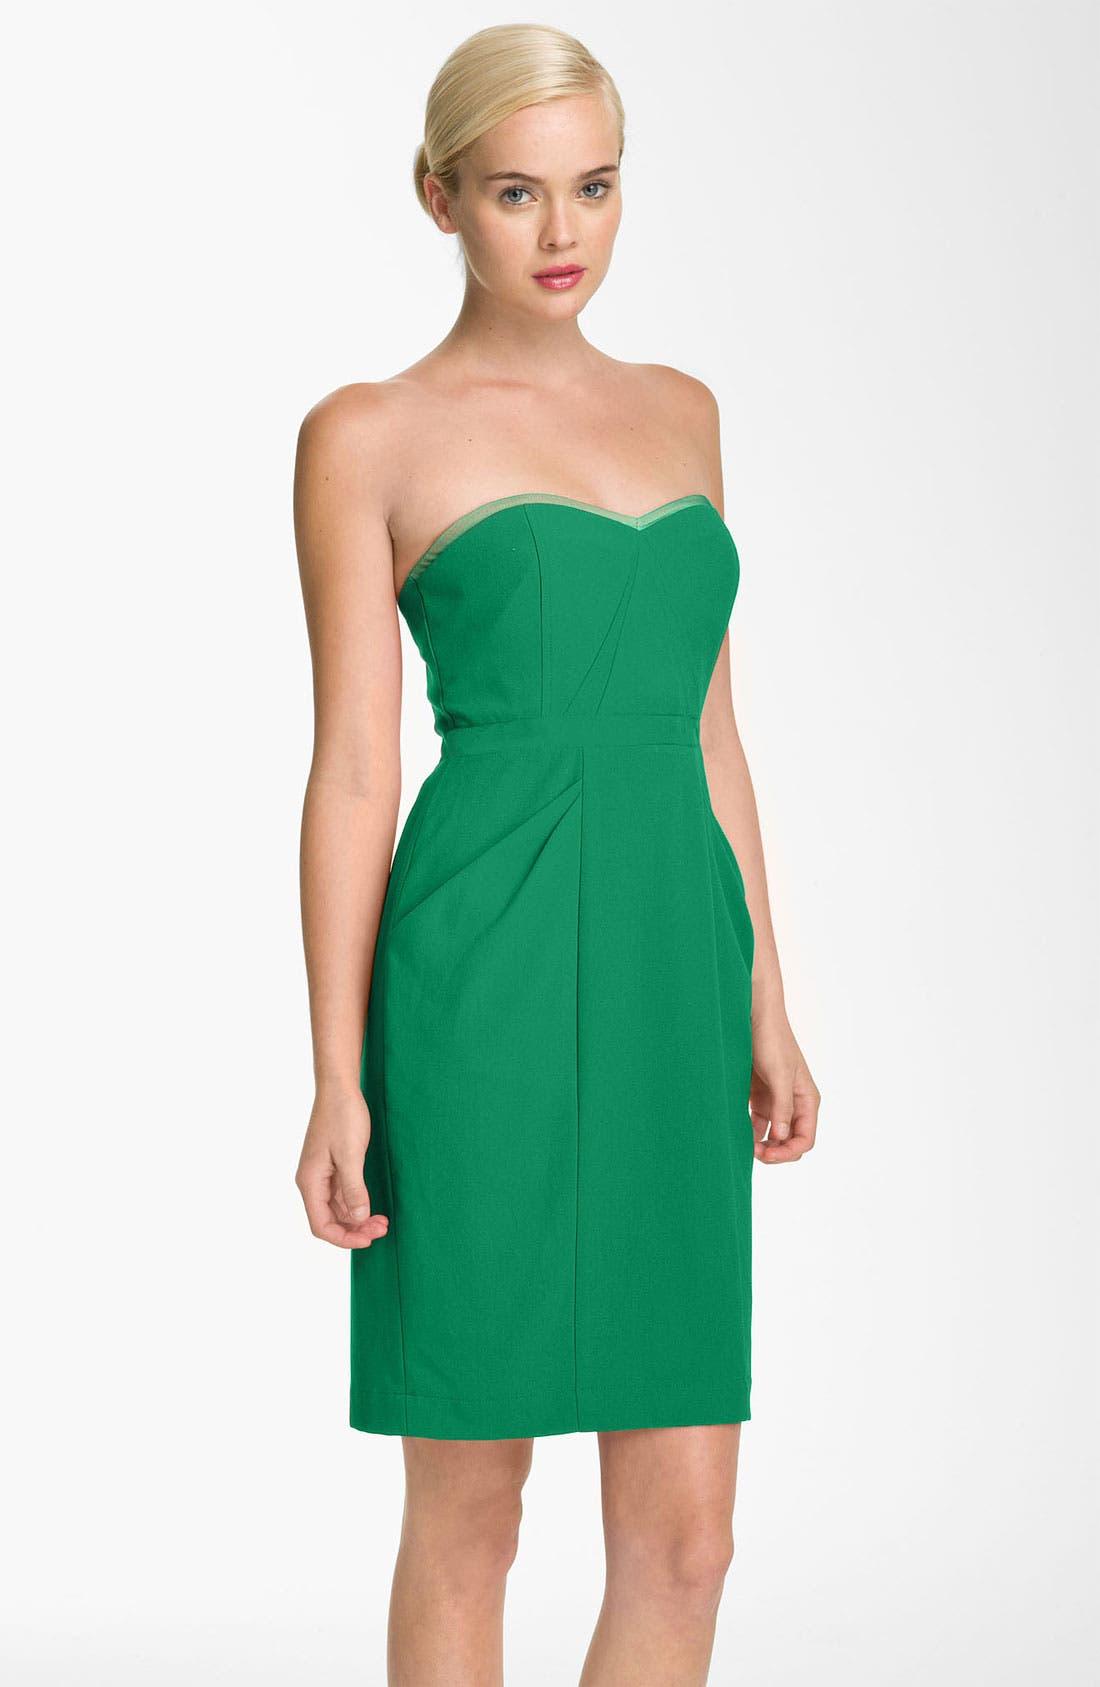 Alternate Image 1 Selected - BCBGMAXAZRIA Sweetheart Neckline Crepe Sheath Dress